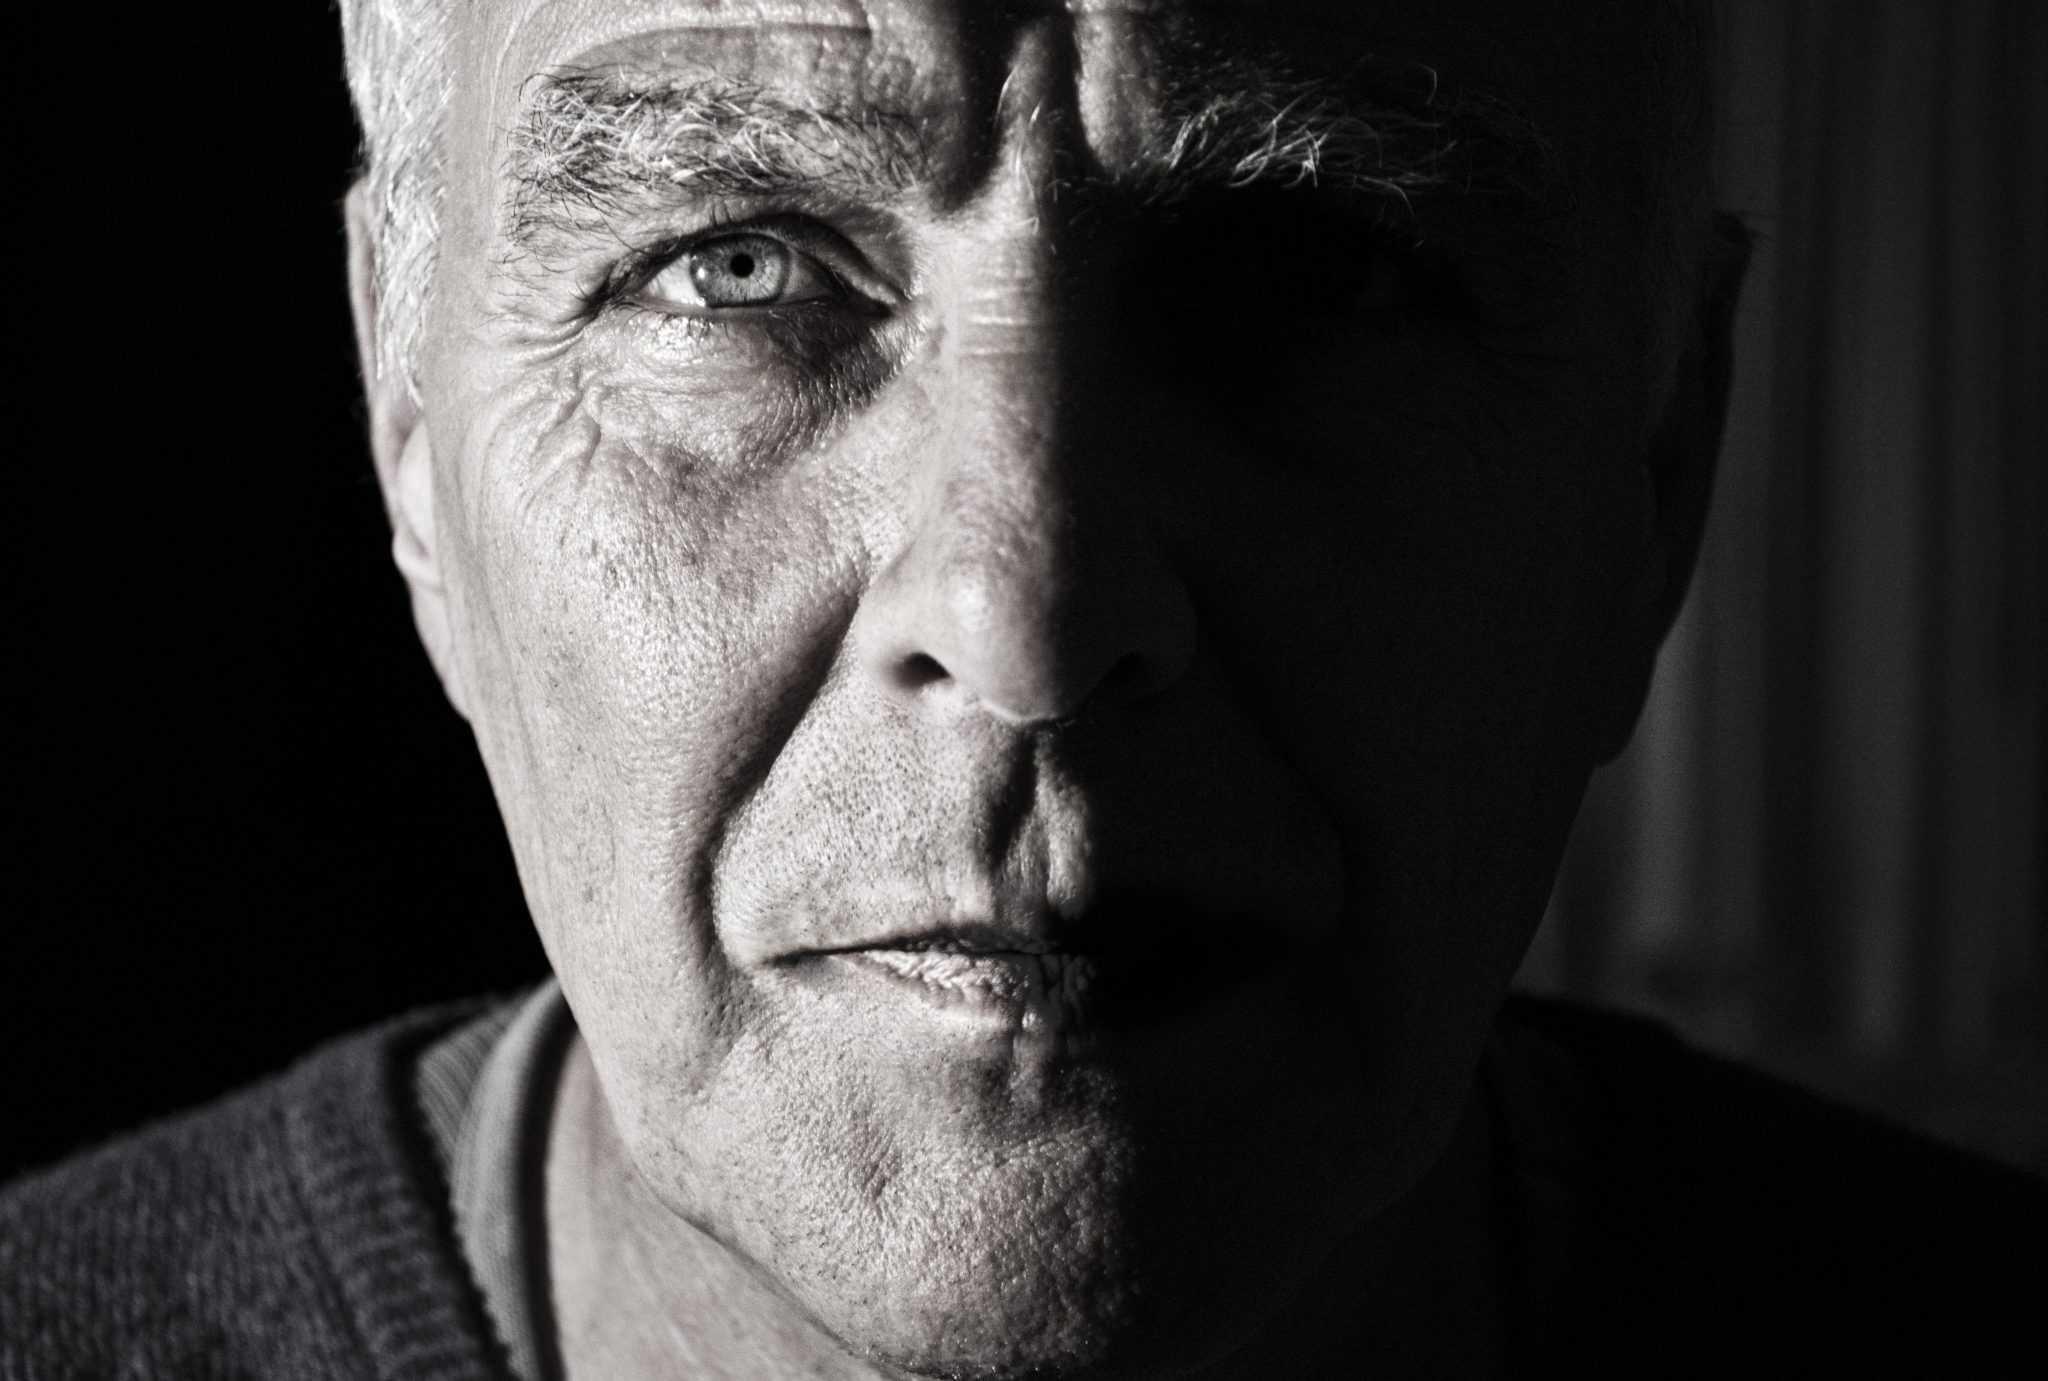 Senior Depression: Identifying and Preventing It